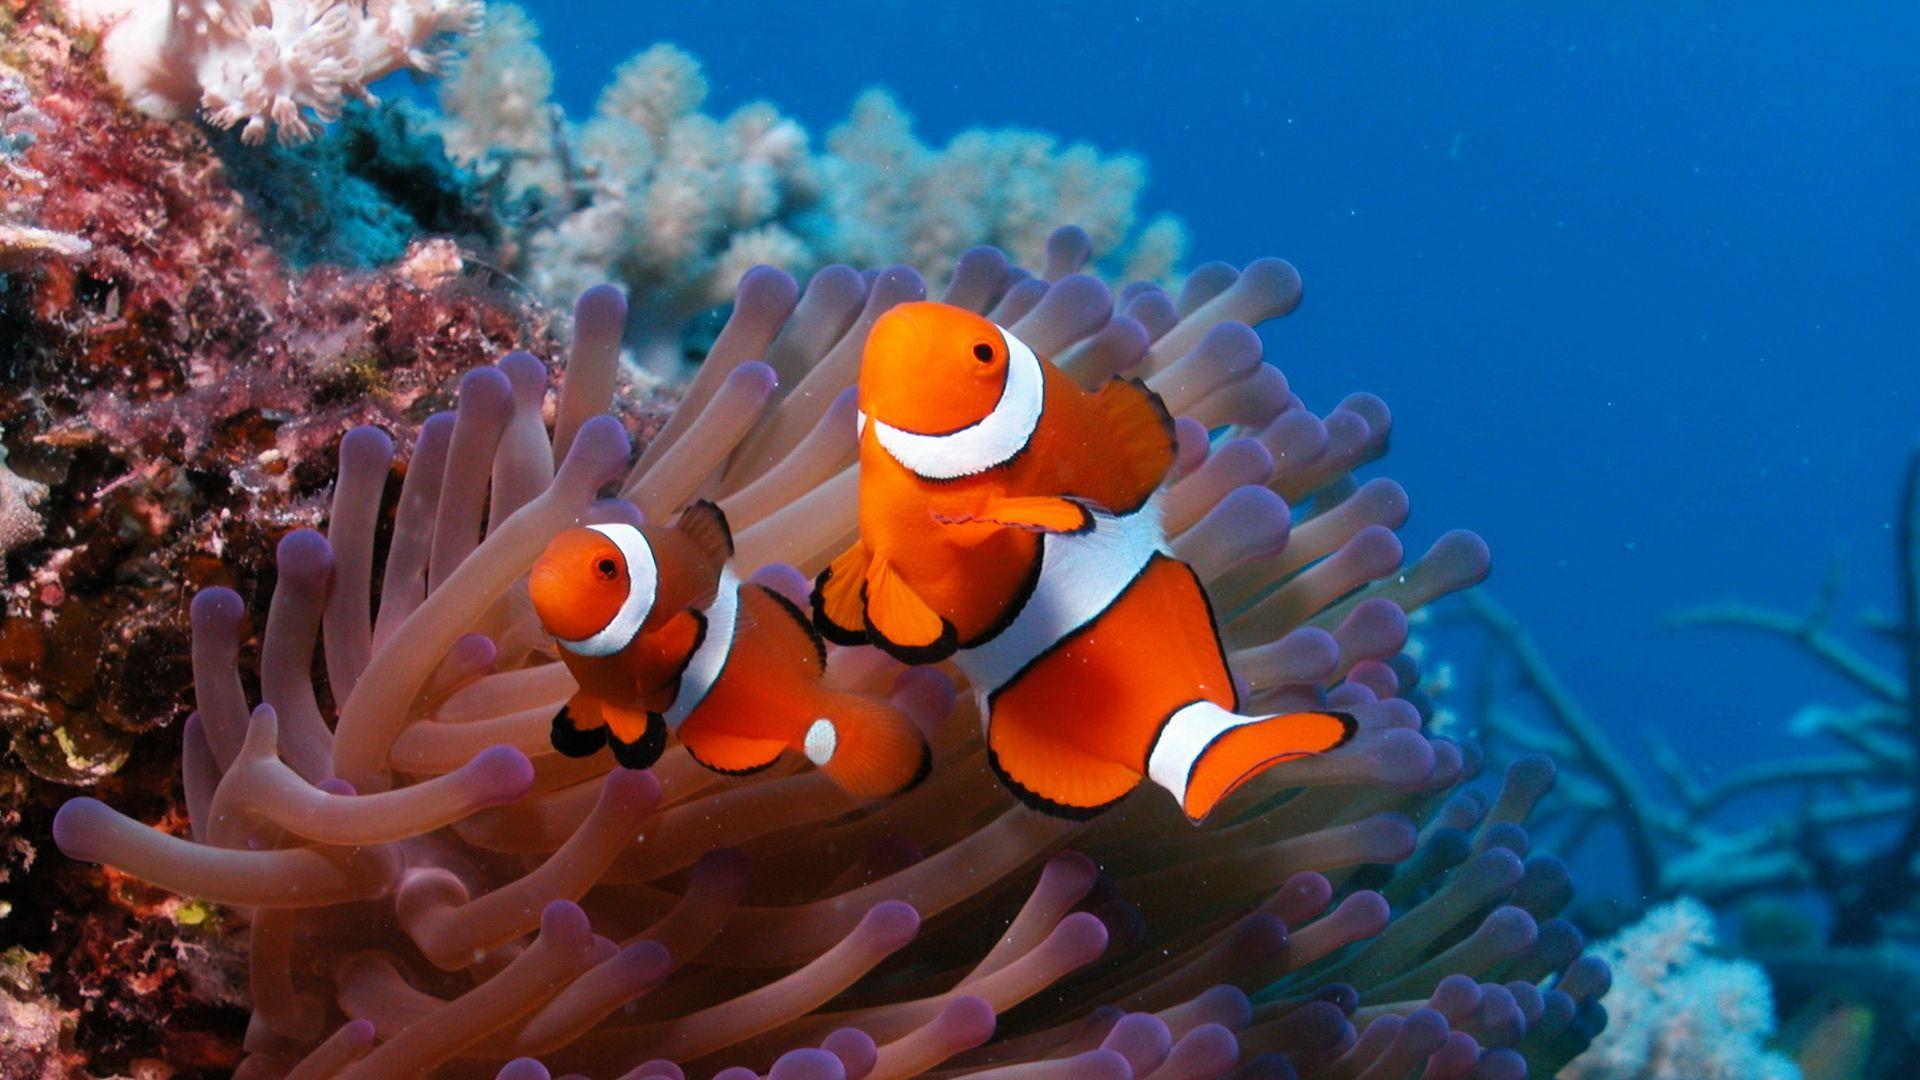 Underwater World HD Wallpapers 1600×1200 Wallpapers Underwater (36 Wallpapers)   Adorable ...